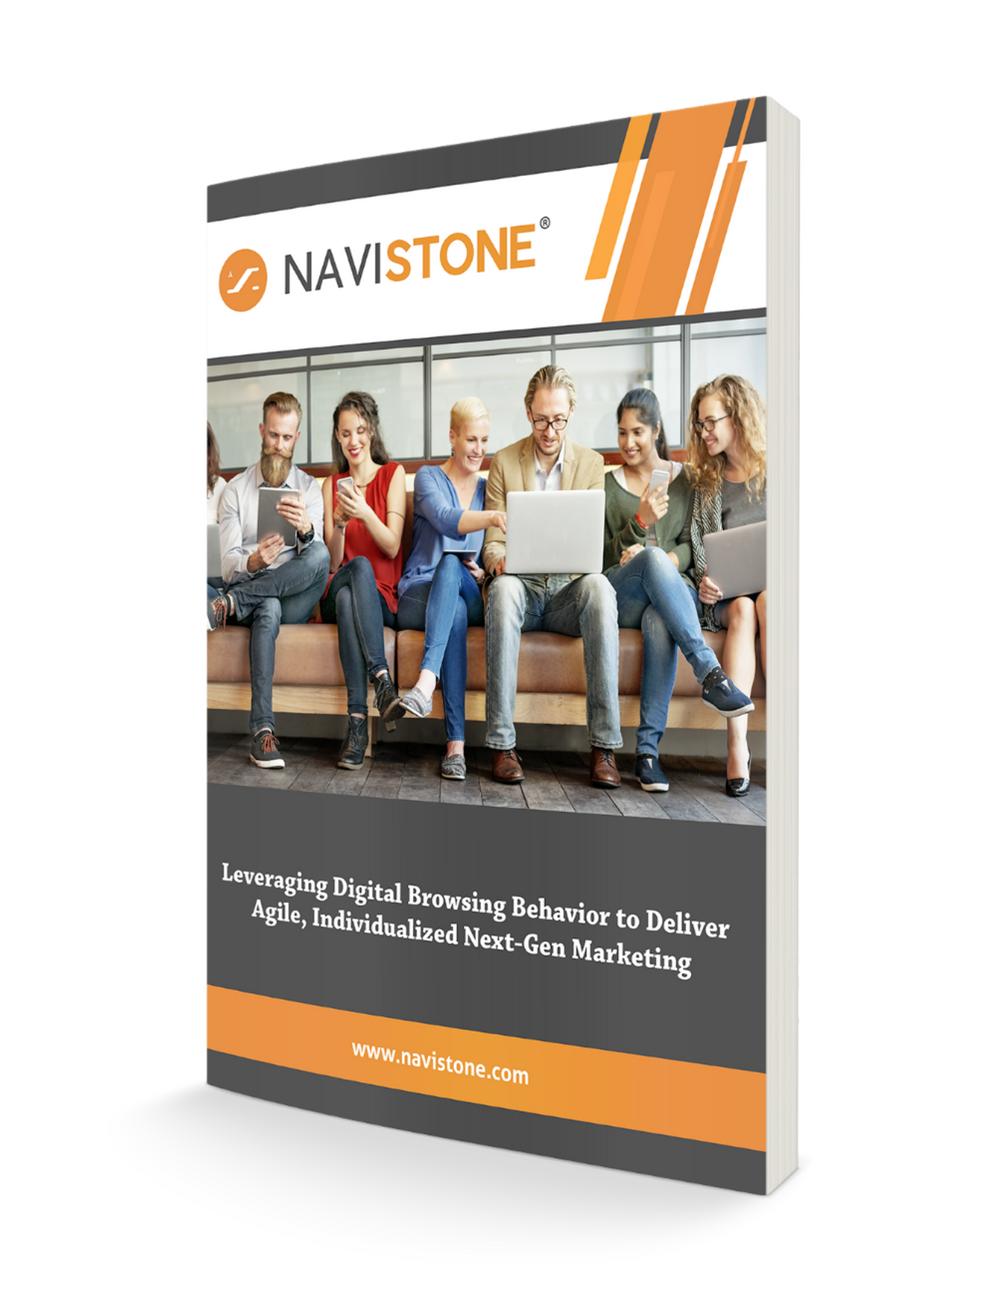 Leveraging Digital Browsing Behavior to Deliver Agile, Individualized Next-Gen Marketing